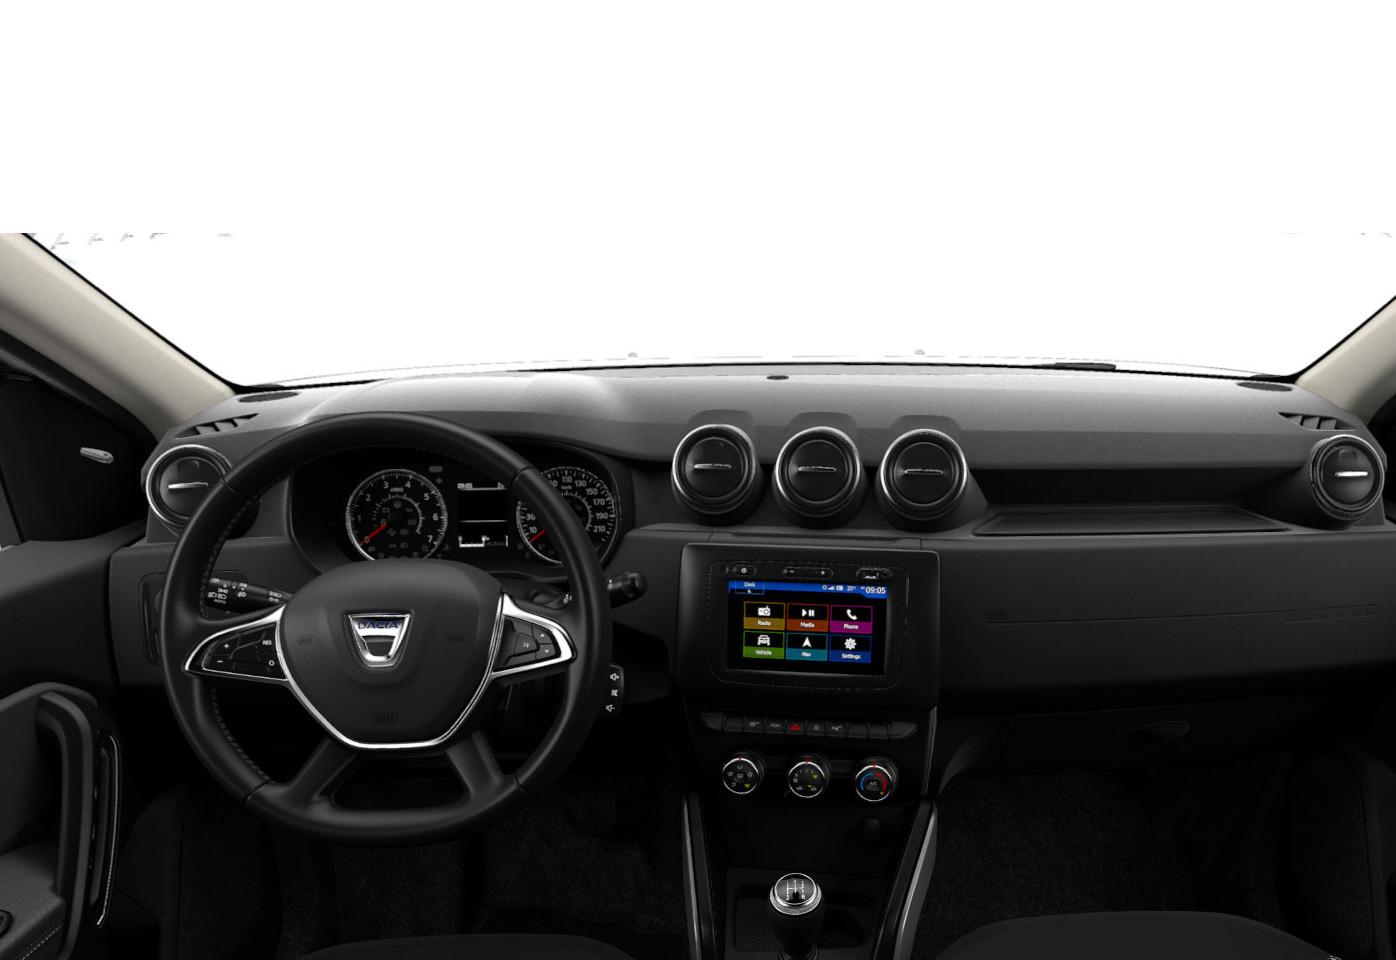 Dacia-Duster-leasen-4